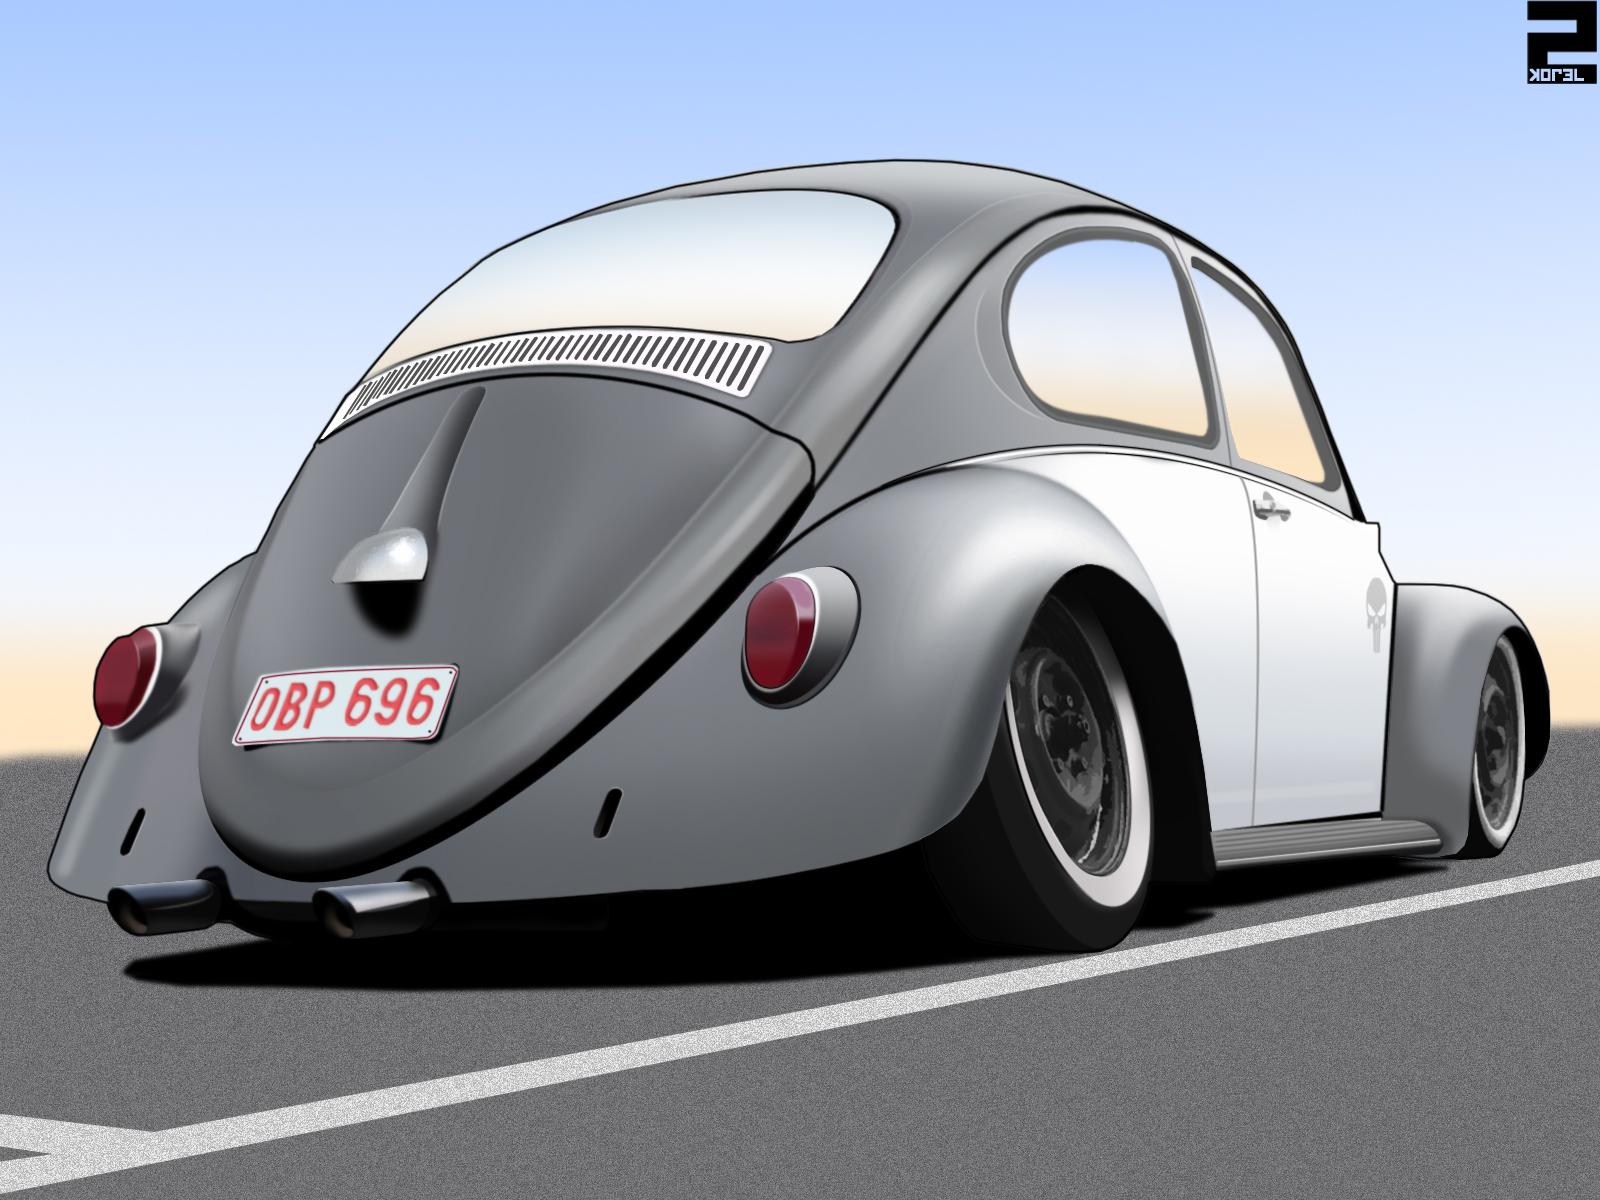 http://3.bp.blogspot.com/-IvGelyl3xy4/Tv_TOwJ0QkI/AAAAAAAAALc/MkkDeSb5uPc/s1600/Hein__VW_Beetle_Vector_by_Kofelstofel.jpg